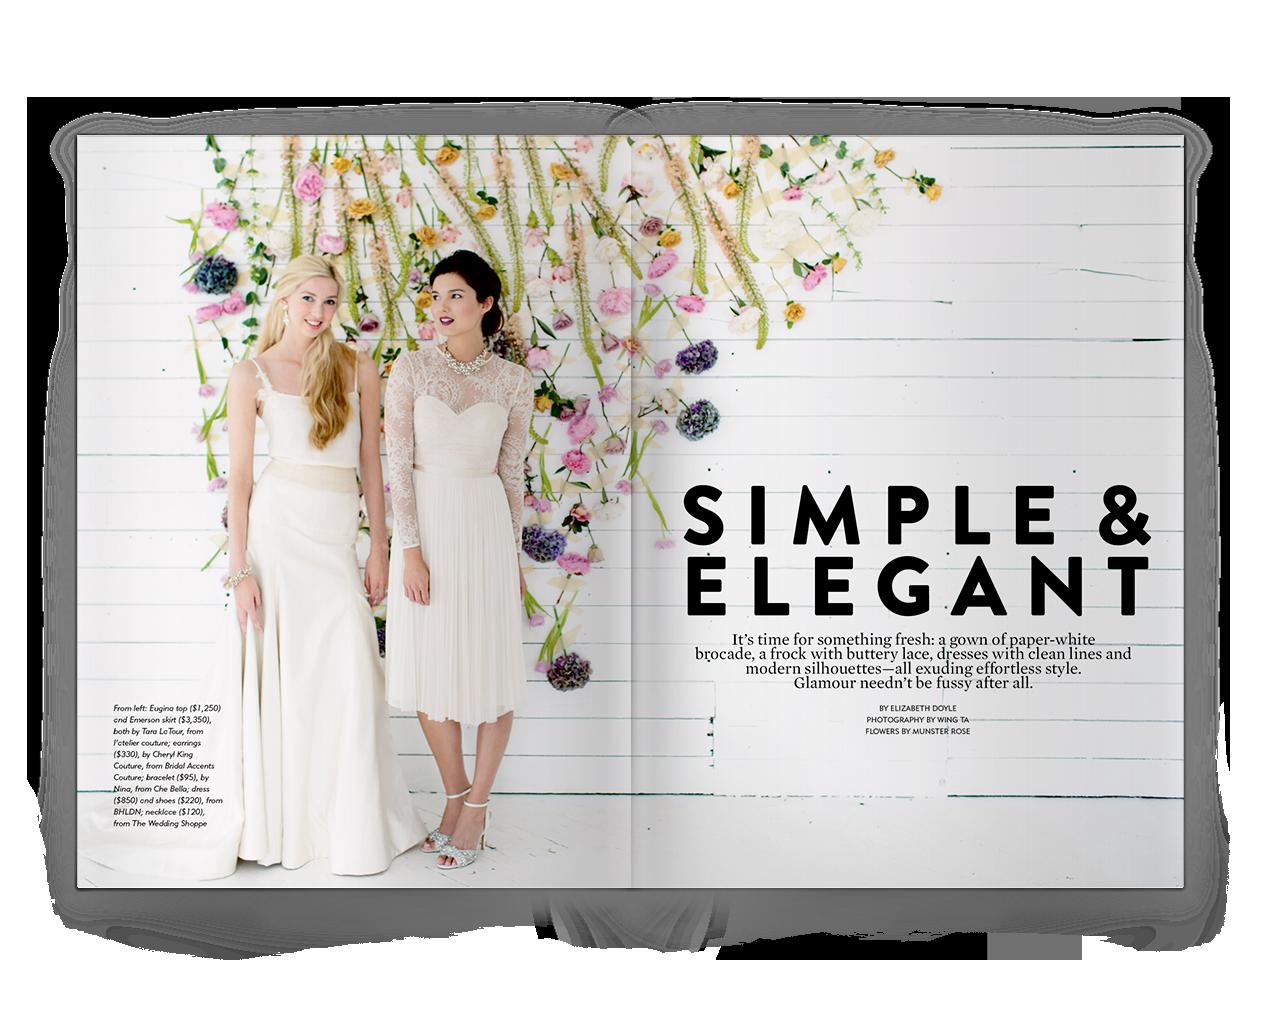 Creative Direction + Design: Liz Gardner for Mpls.St.Paul magazine Editor: Emily Howald Sefton Photographer: Canary Grey HMUA: Romeny Chan Fashion Stylist: Elizabeth Doyle Floral: Munster Rose